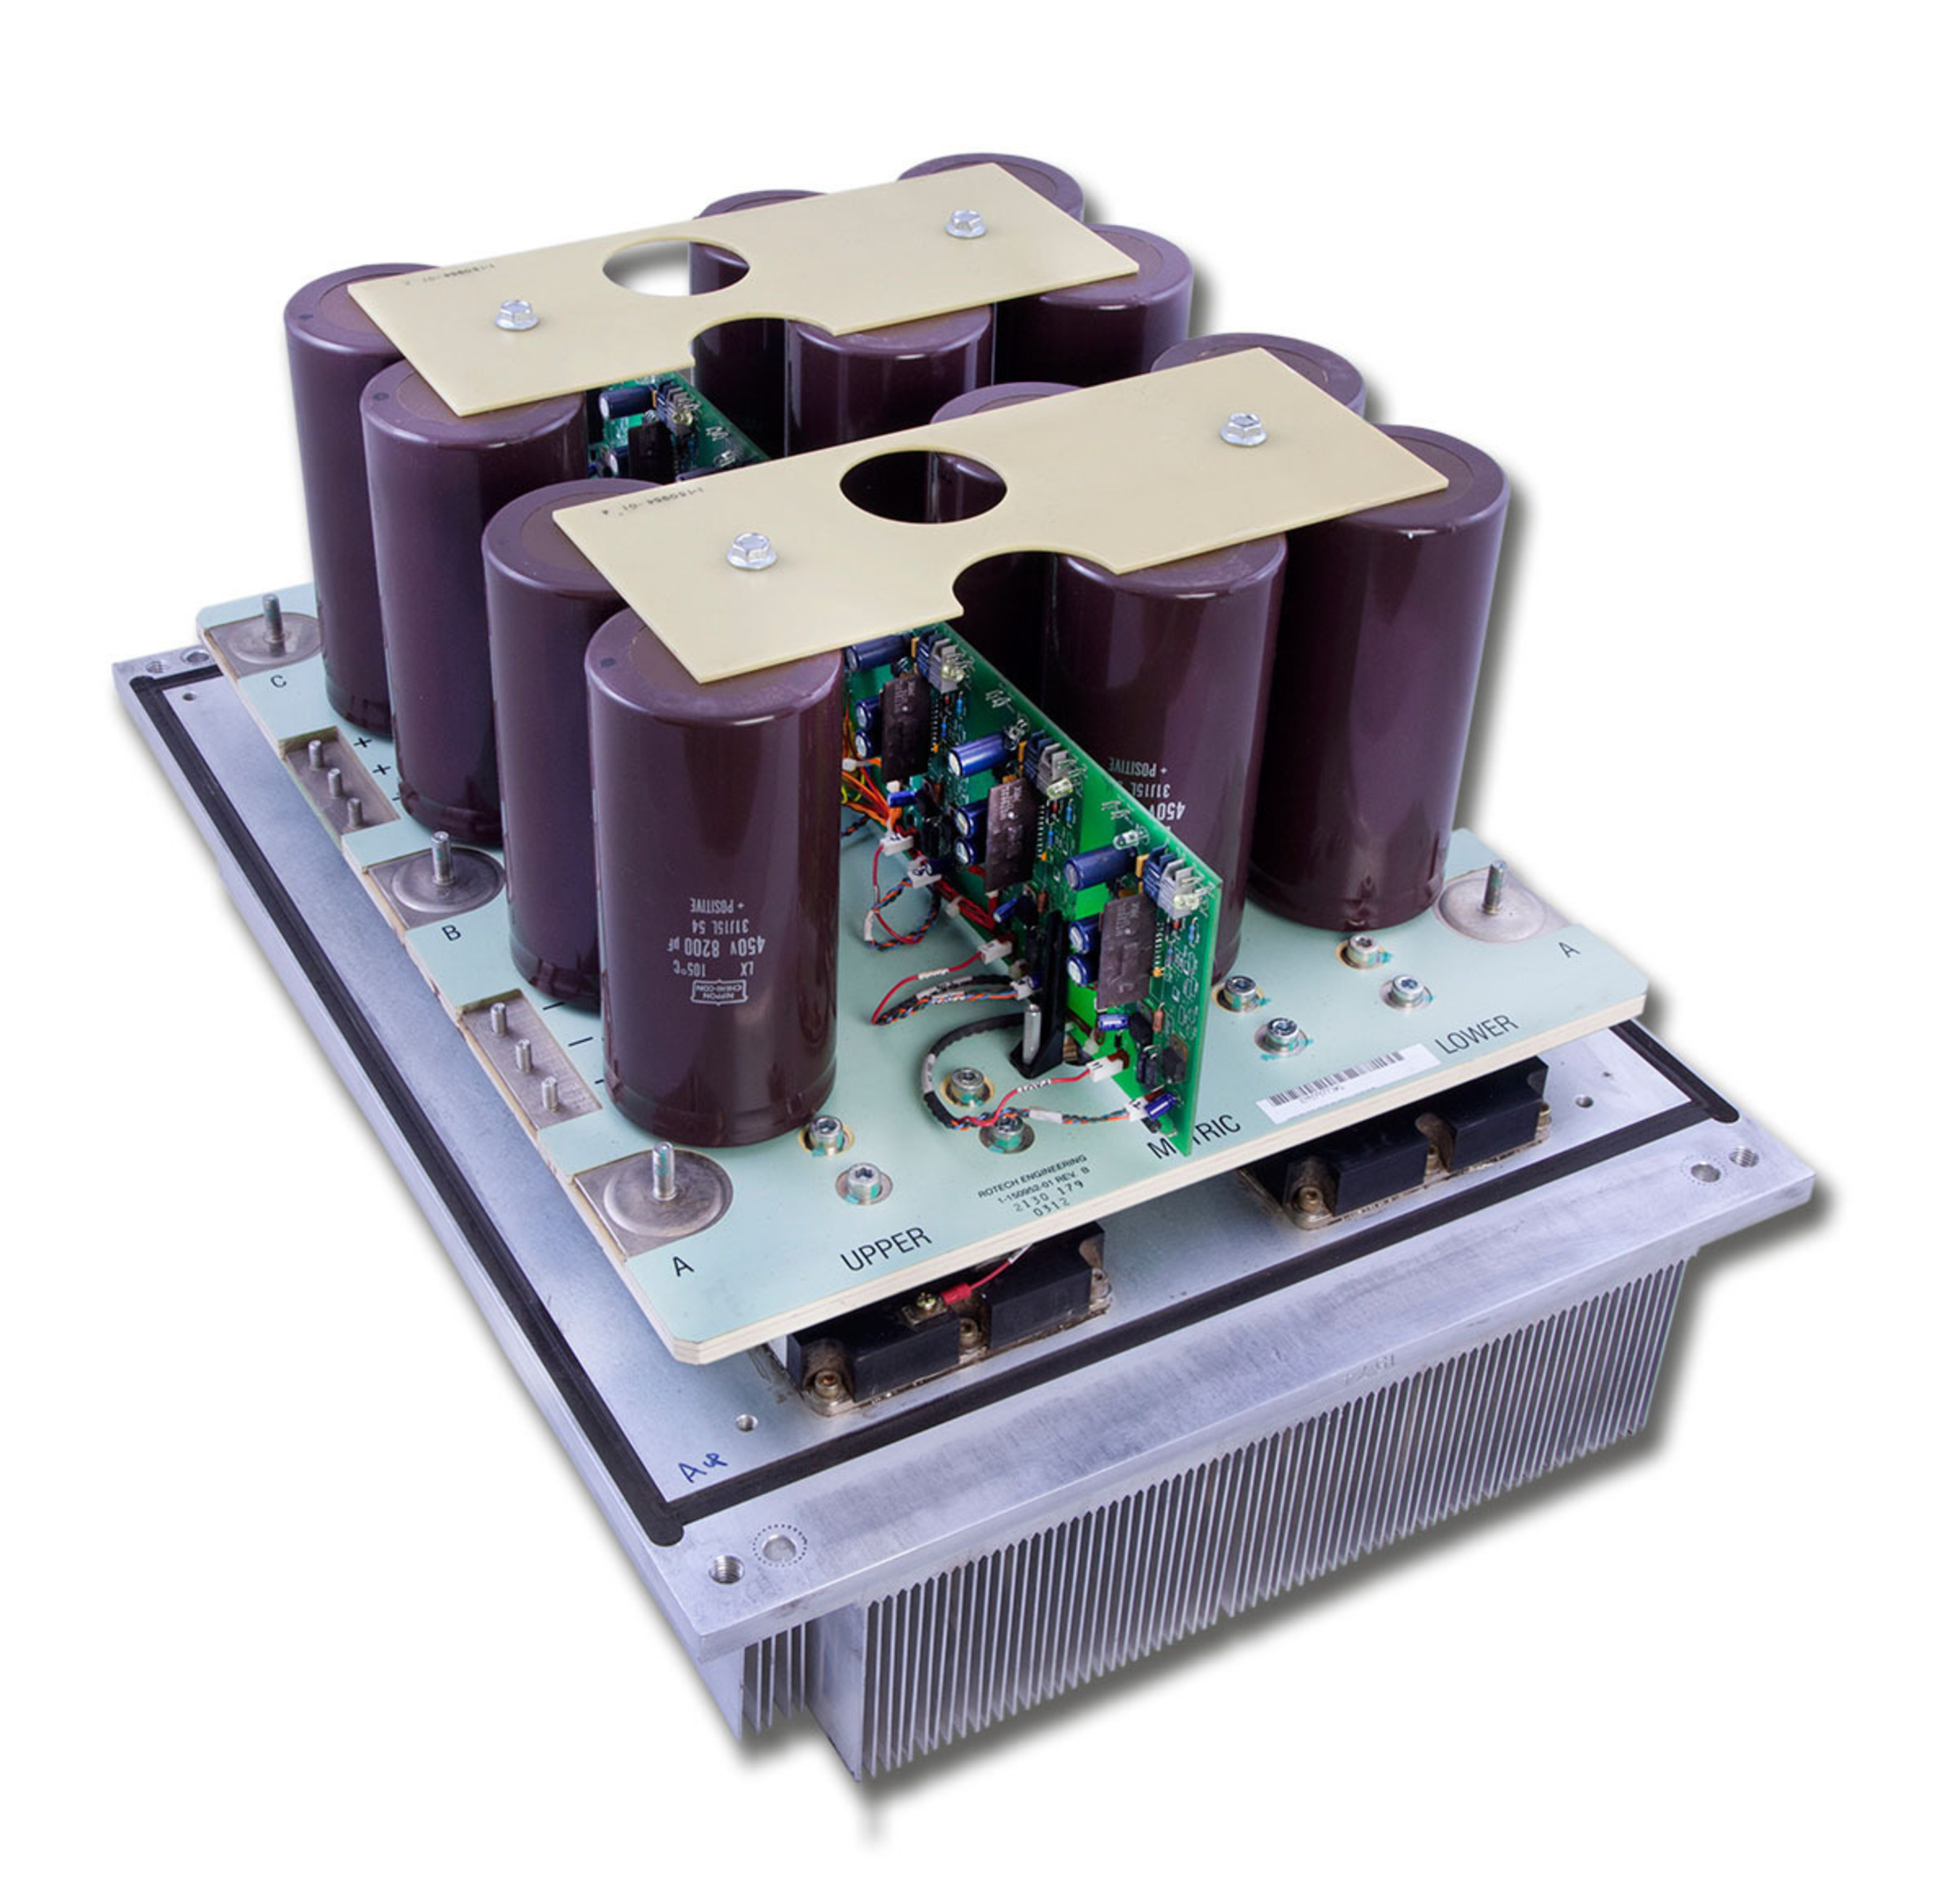 Xantrex Matrix Replacement Inverter.  (PRNewsFoto/PSI Repair Services, Inc.)